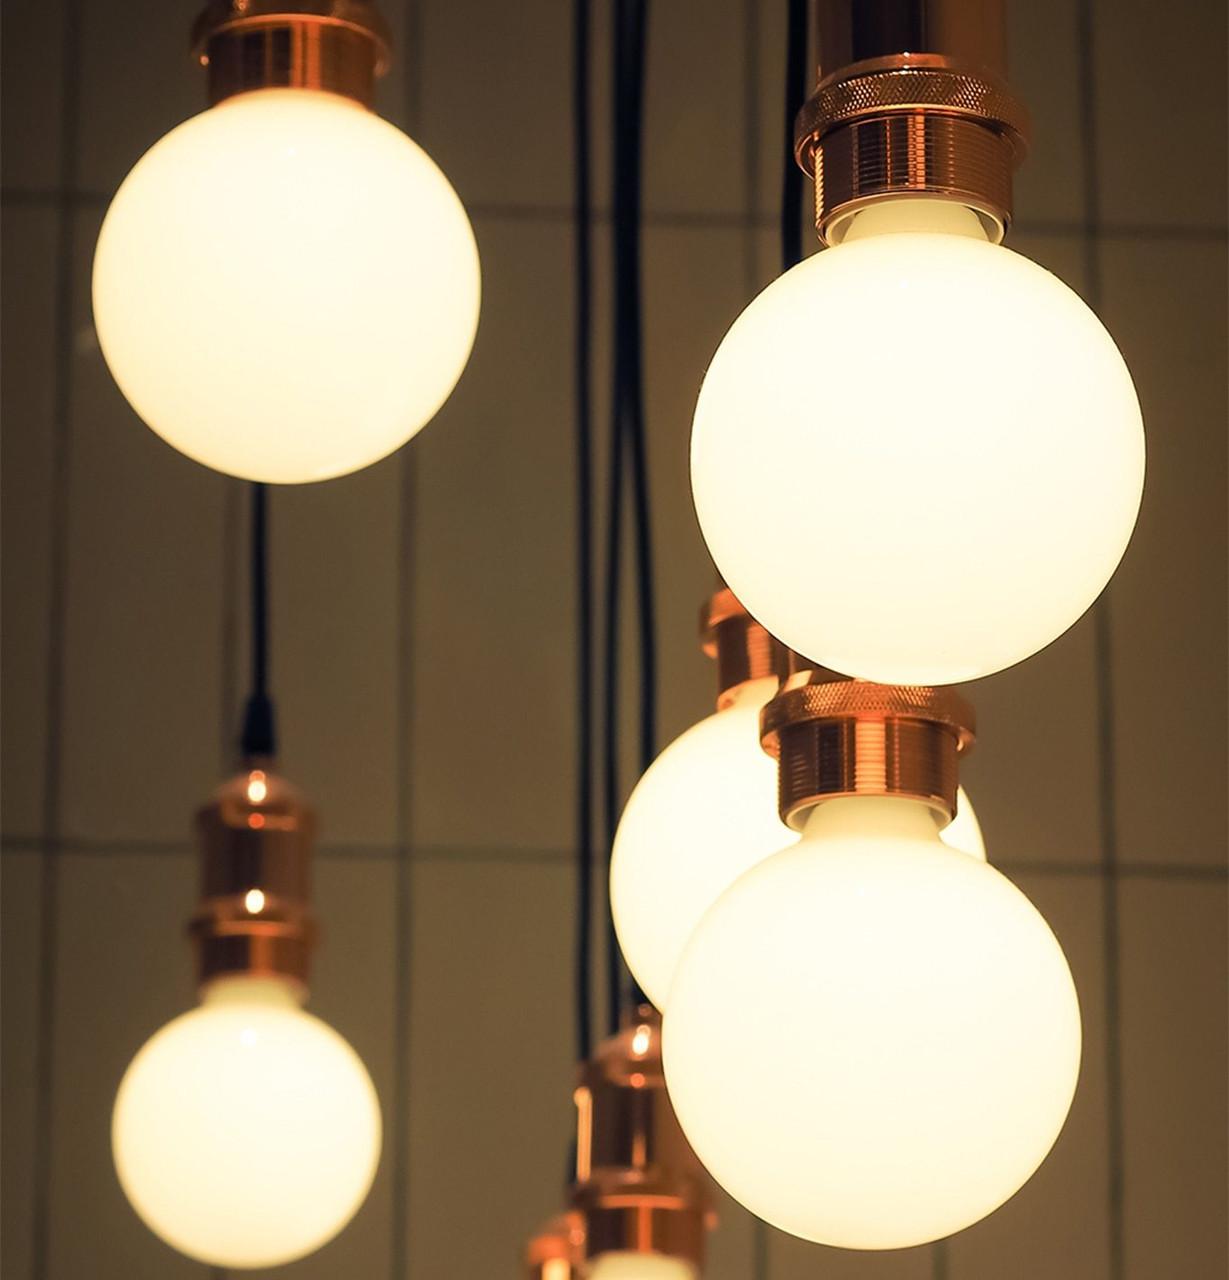 LED Dimmable Globe ES-E27 Light Bulbs